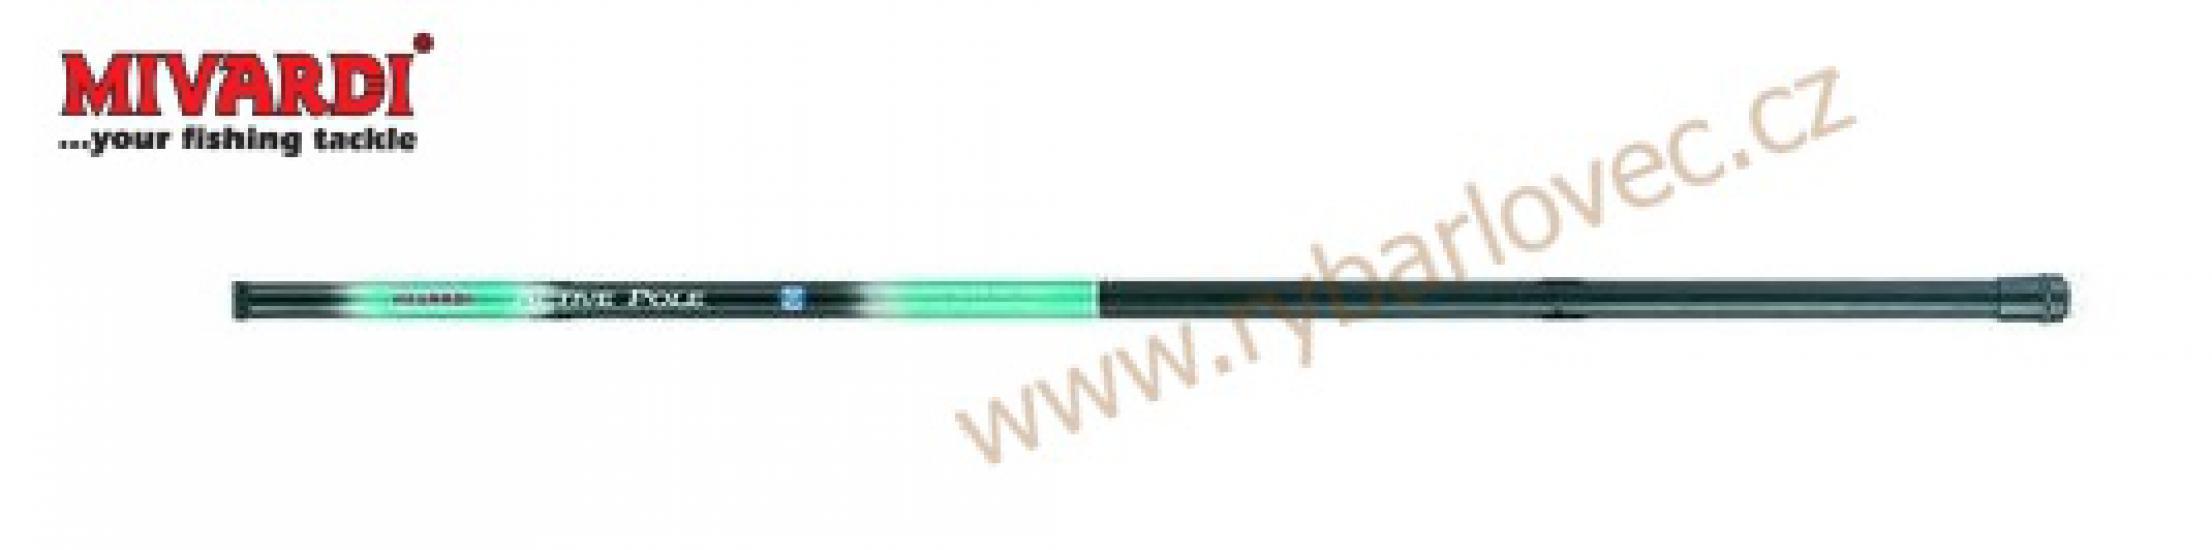 Bič Mivardi Active Pole 5,0 m 5 - 25 g